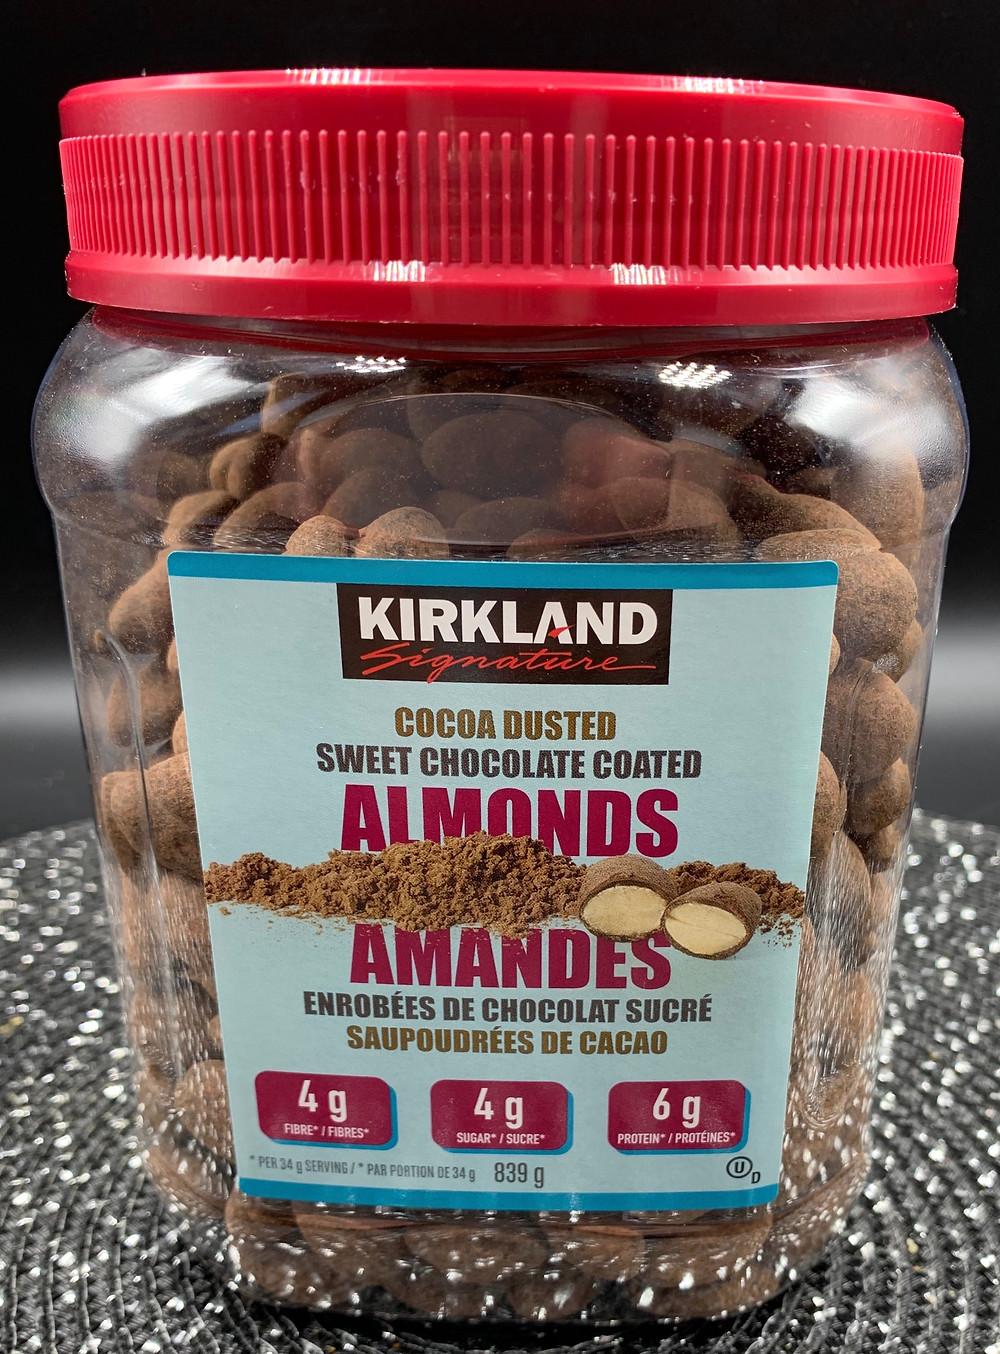 Costco Kirkland Signature Cocoa Dusted Sweet Chocolate Almonds